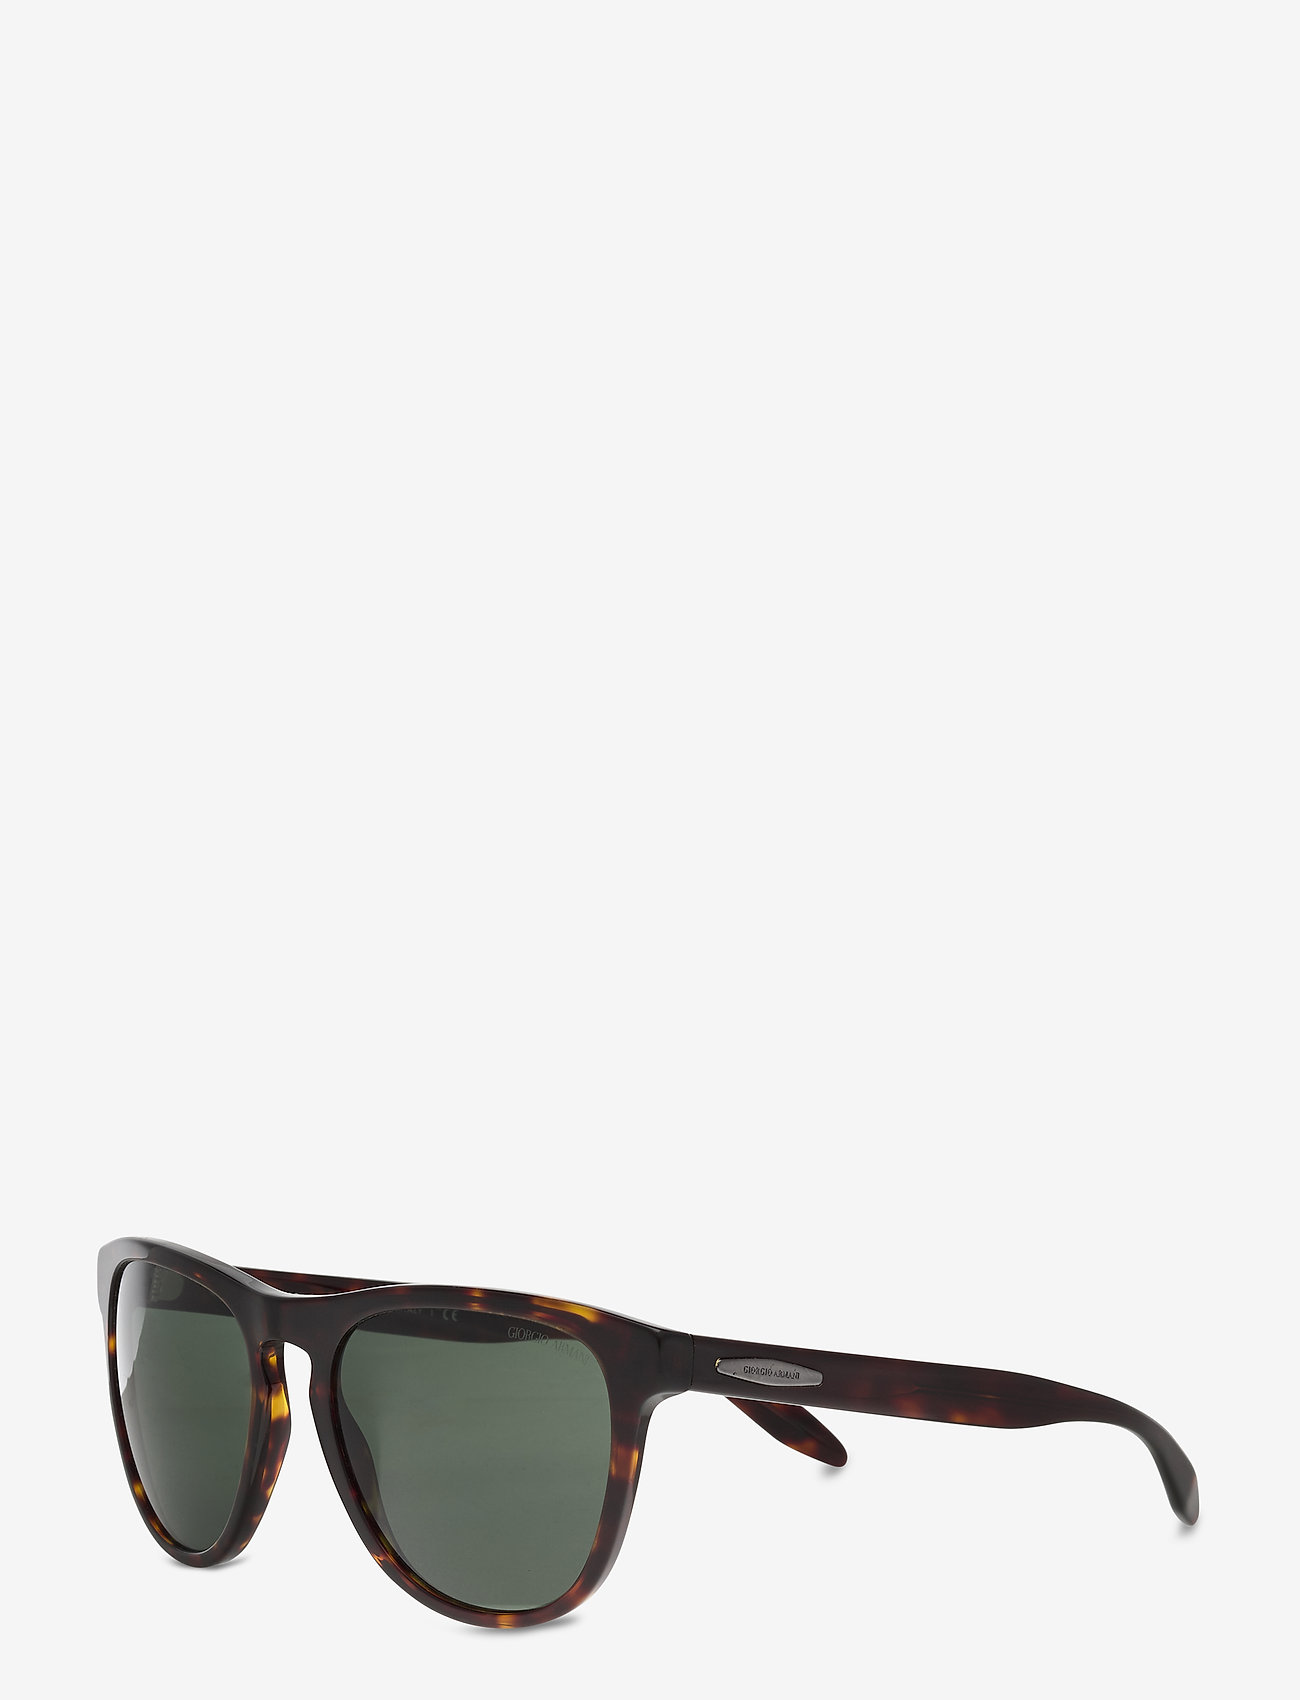 Giorgio Armani Sunglasses - 0AR8116 - d-shaped - dark havana - 1